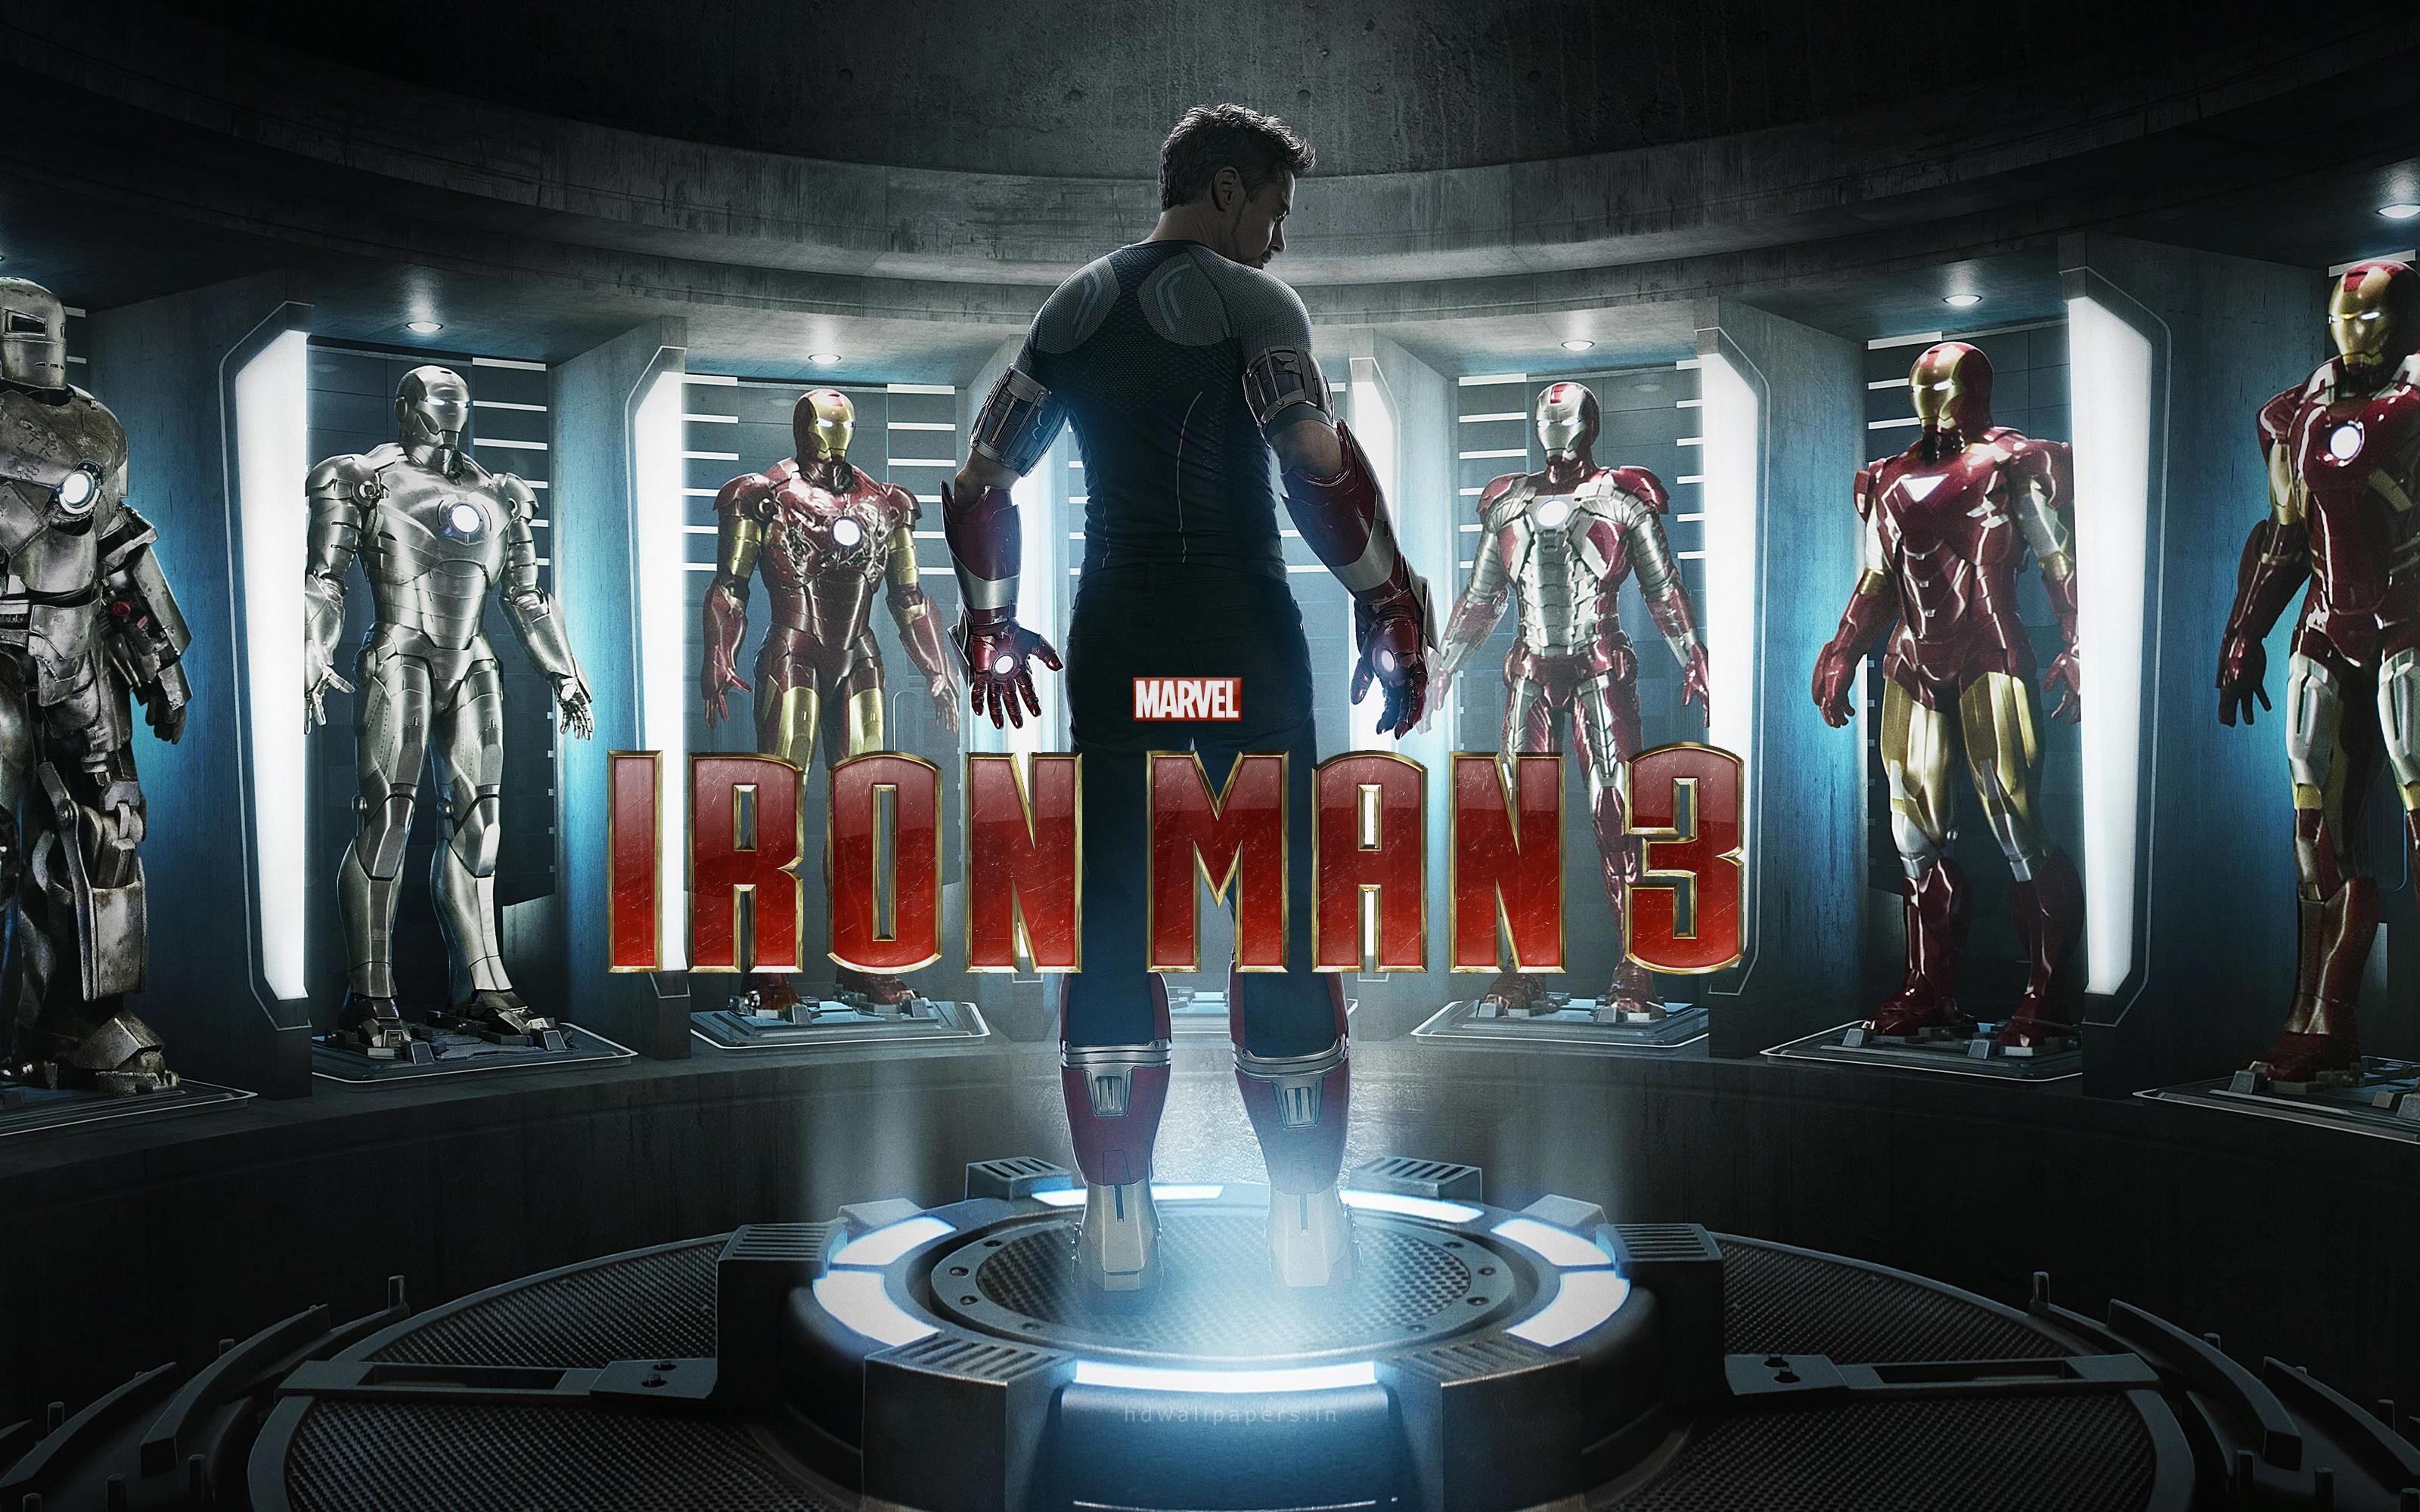 6954943-iron-man-3-hd-movie-wallpaper